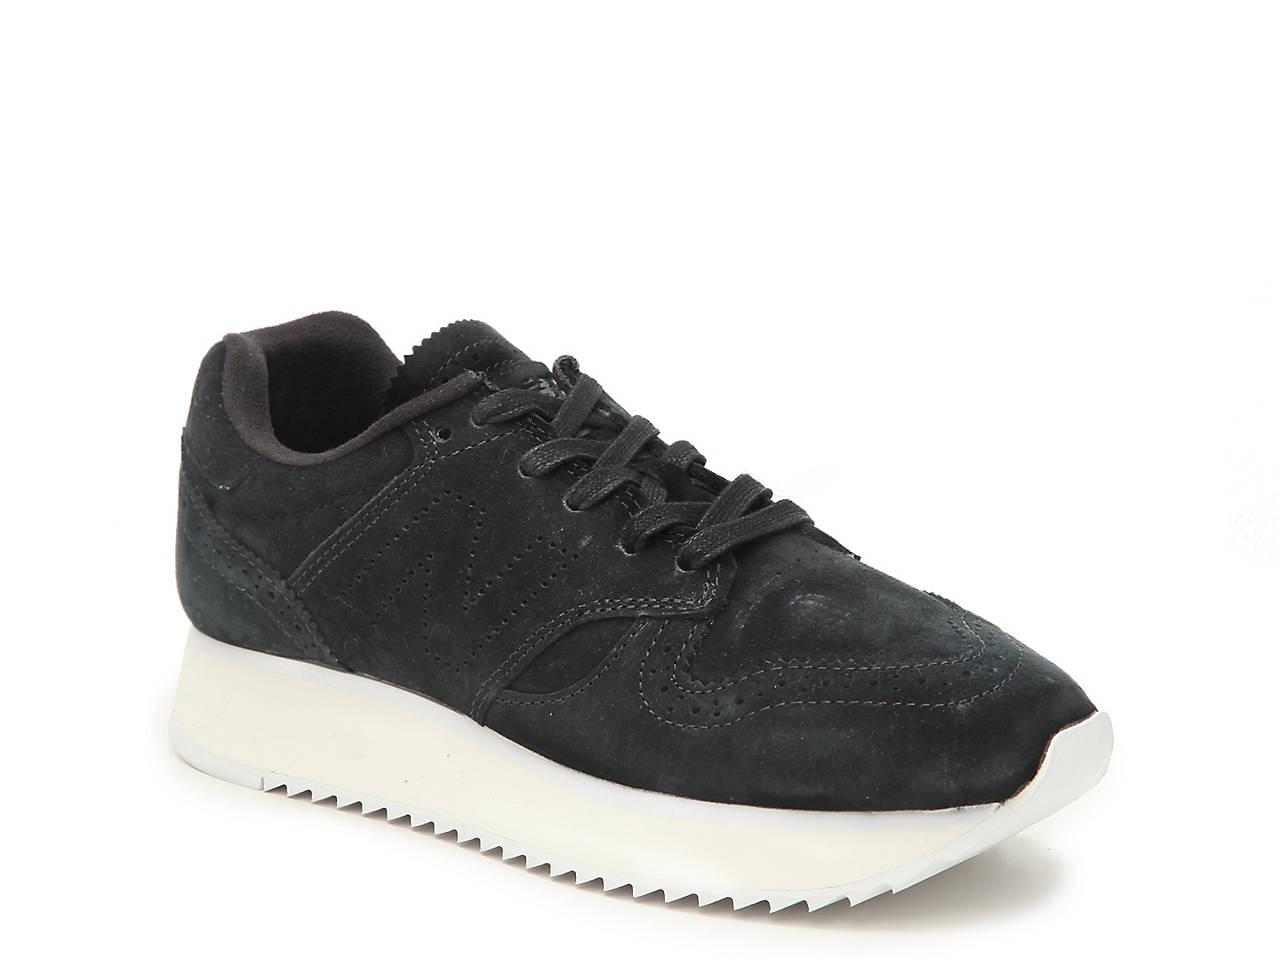 28e185027116 New Balance 520 Platform Sneaker - Women s Women s Shoes